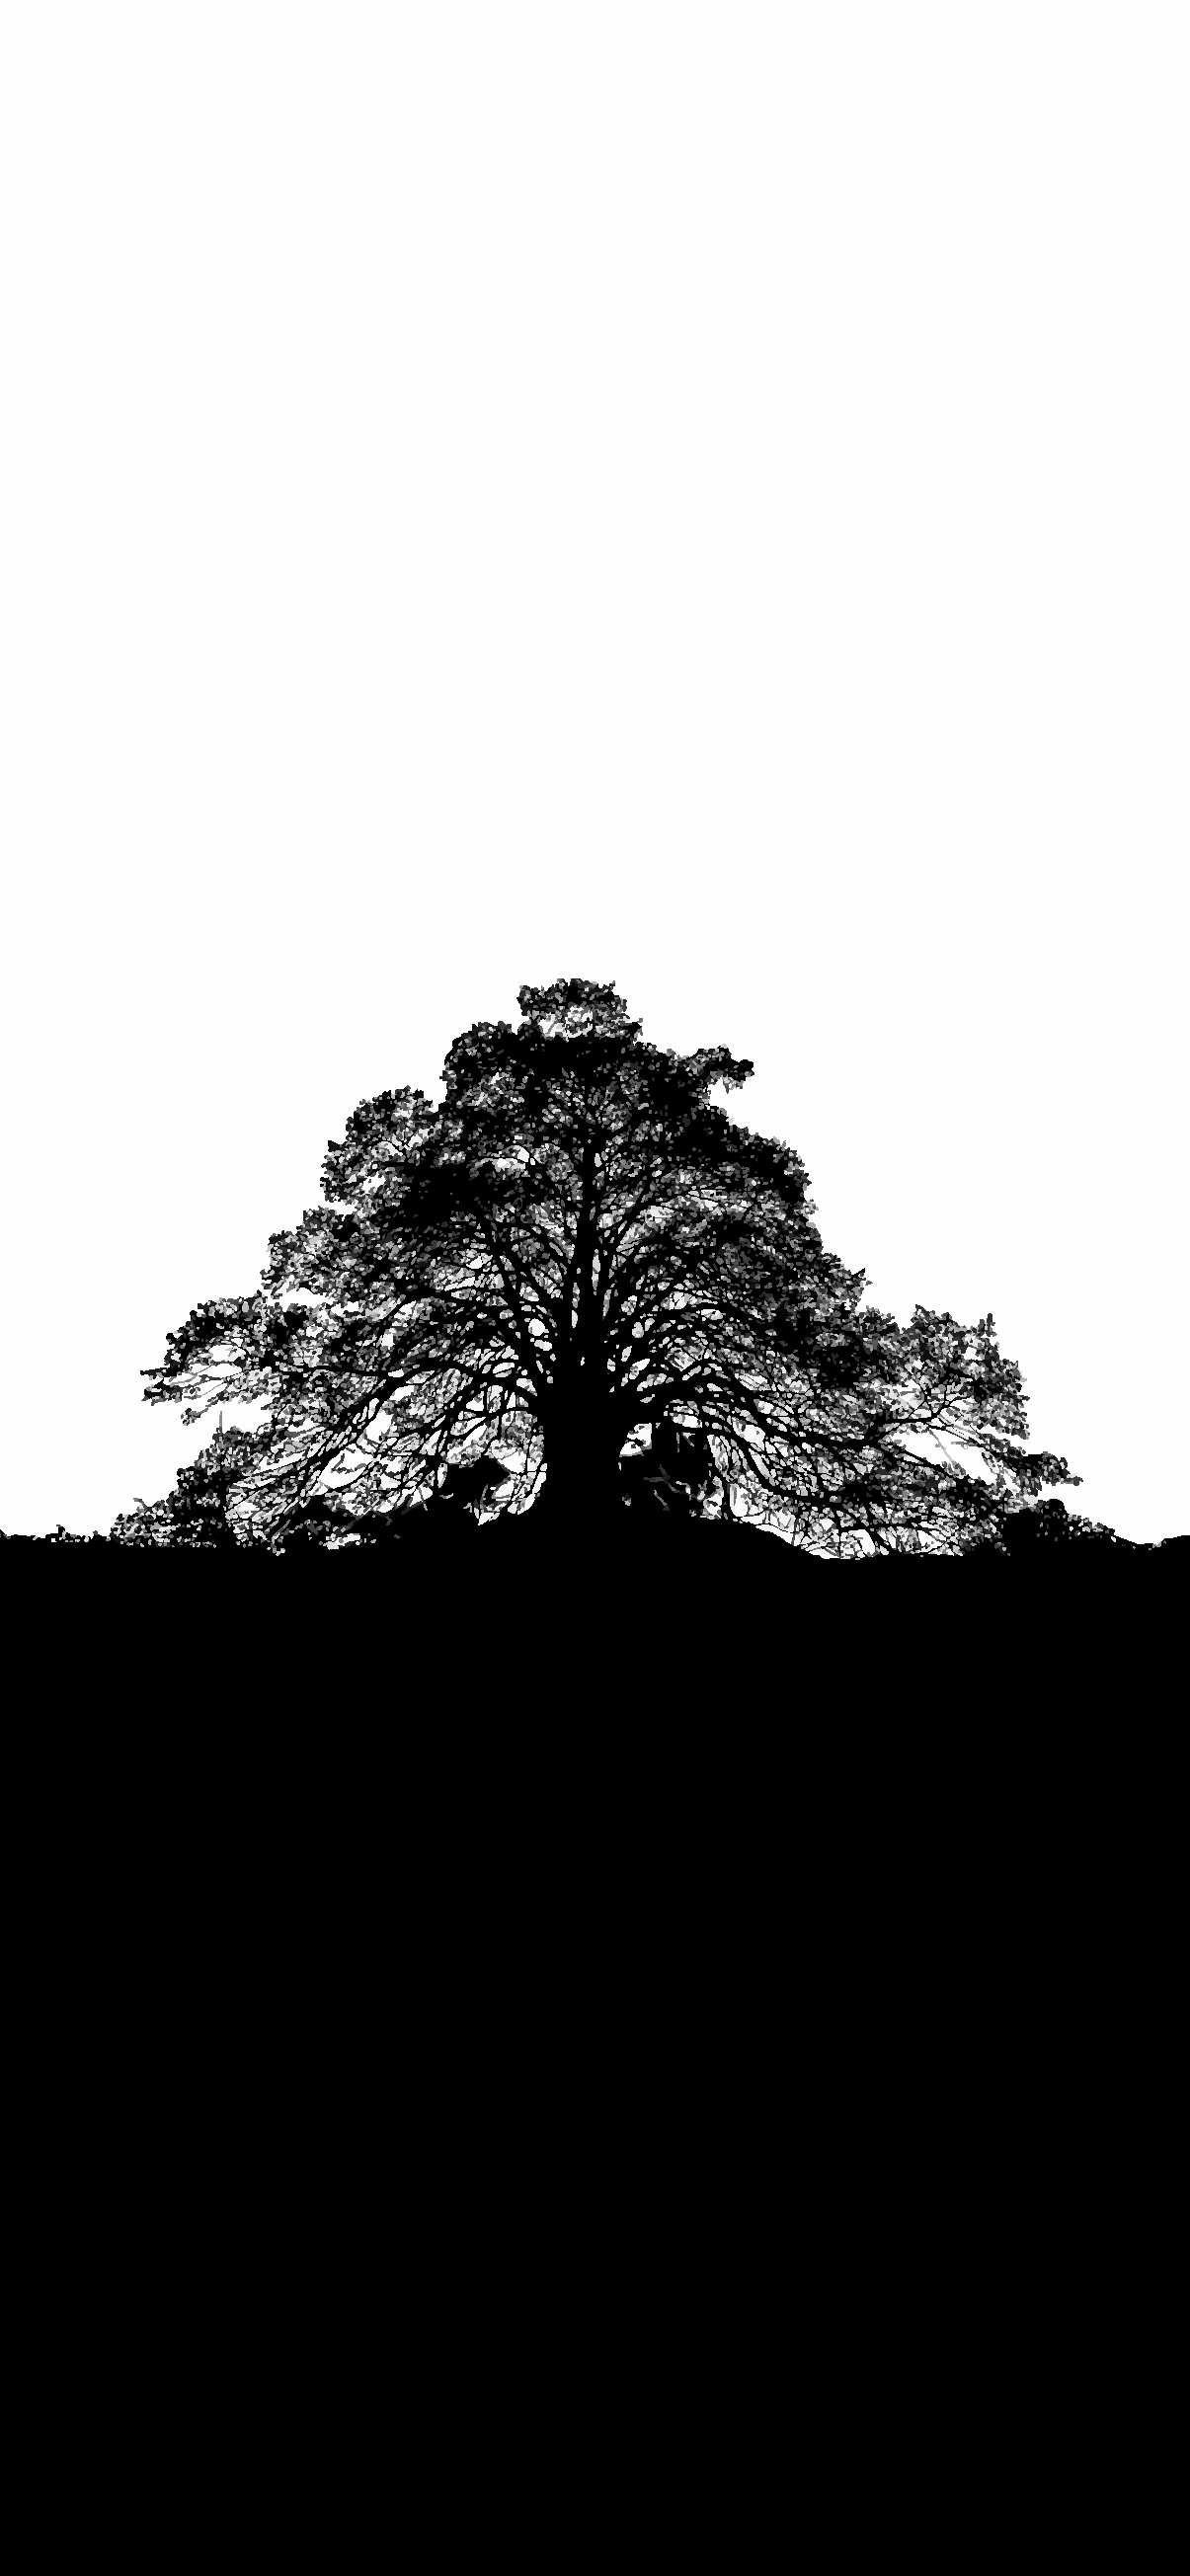 BW TREE WALLPAPER PHONE HD